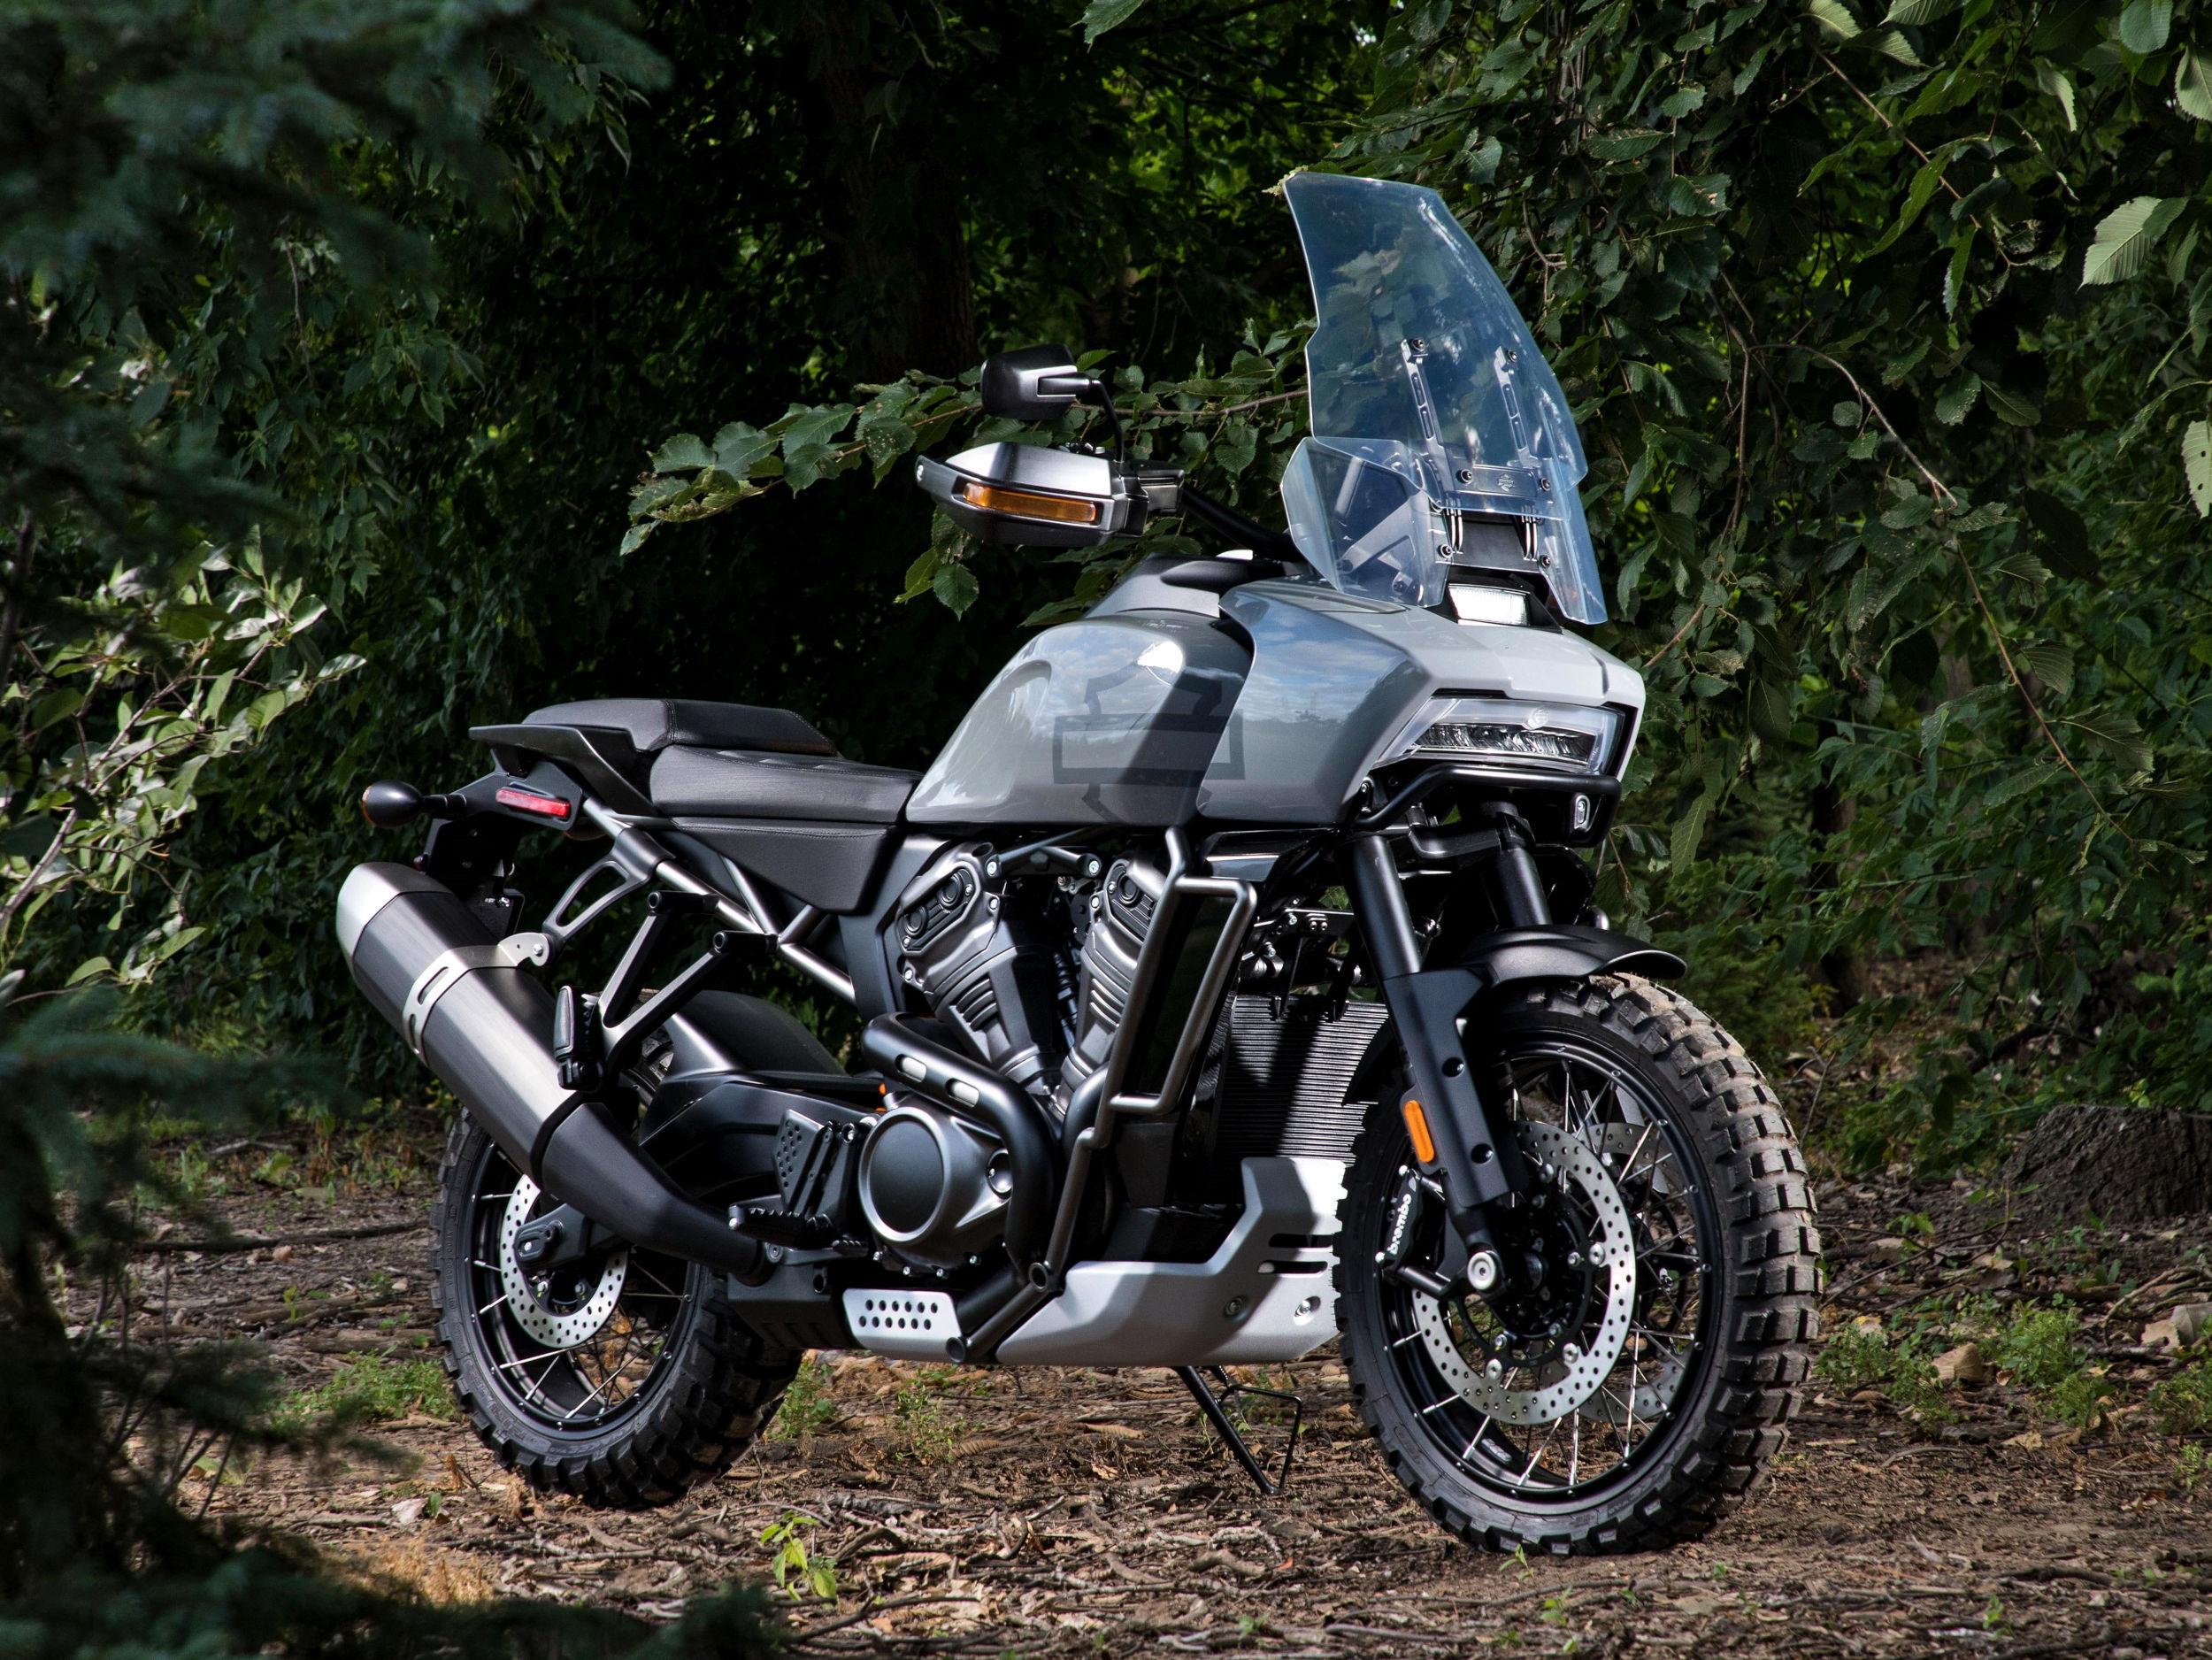 Best Liquid Cooling 2020 Harley Davidson Developing New, Liquid Cooled Models for Adventure